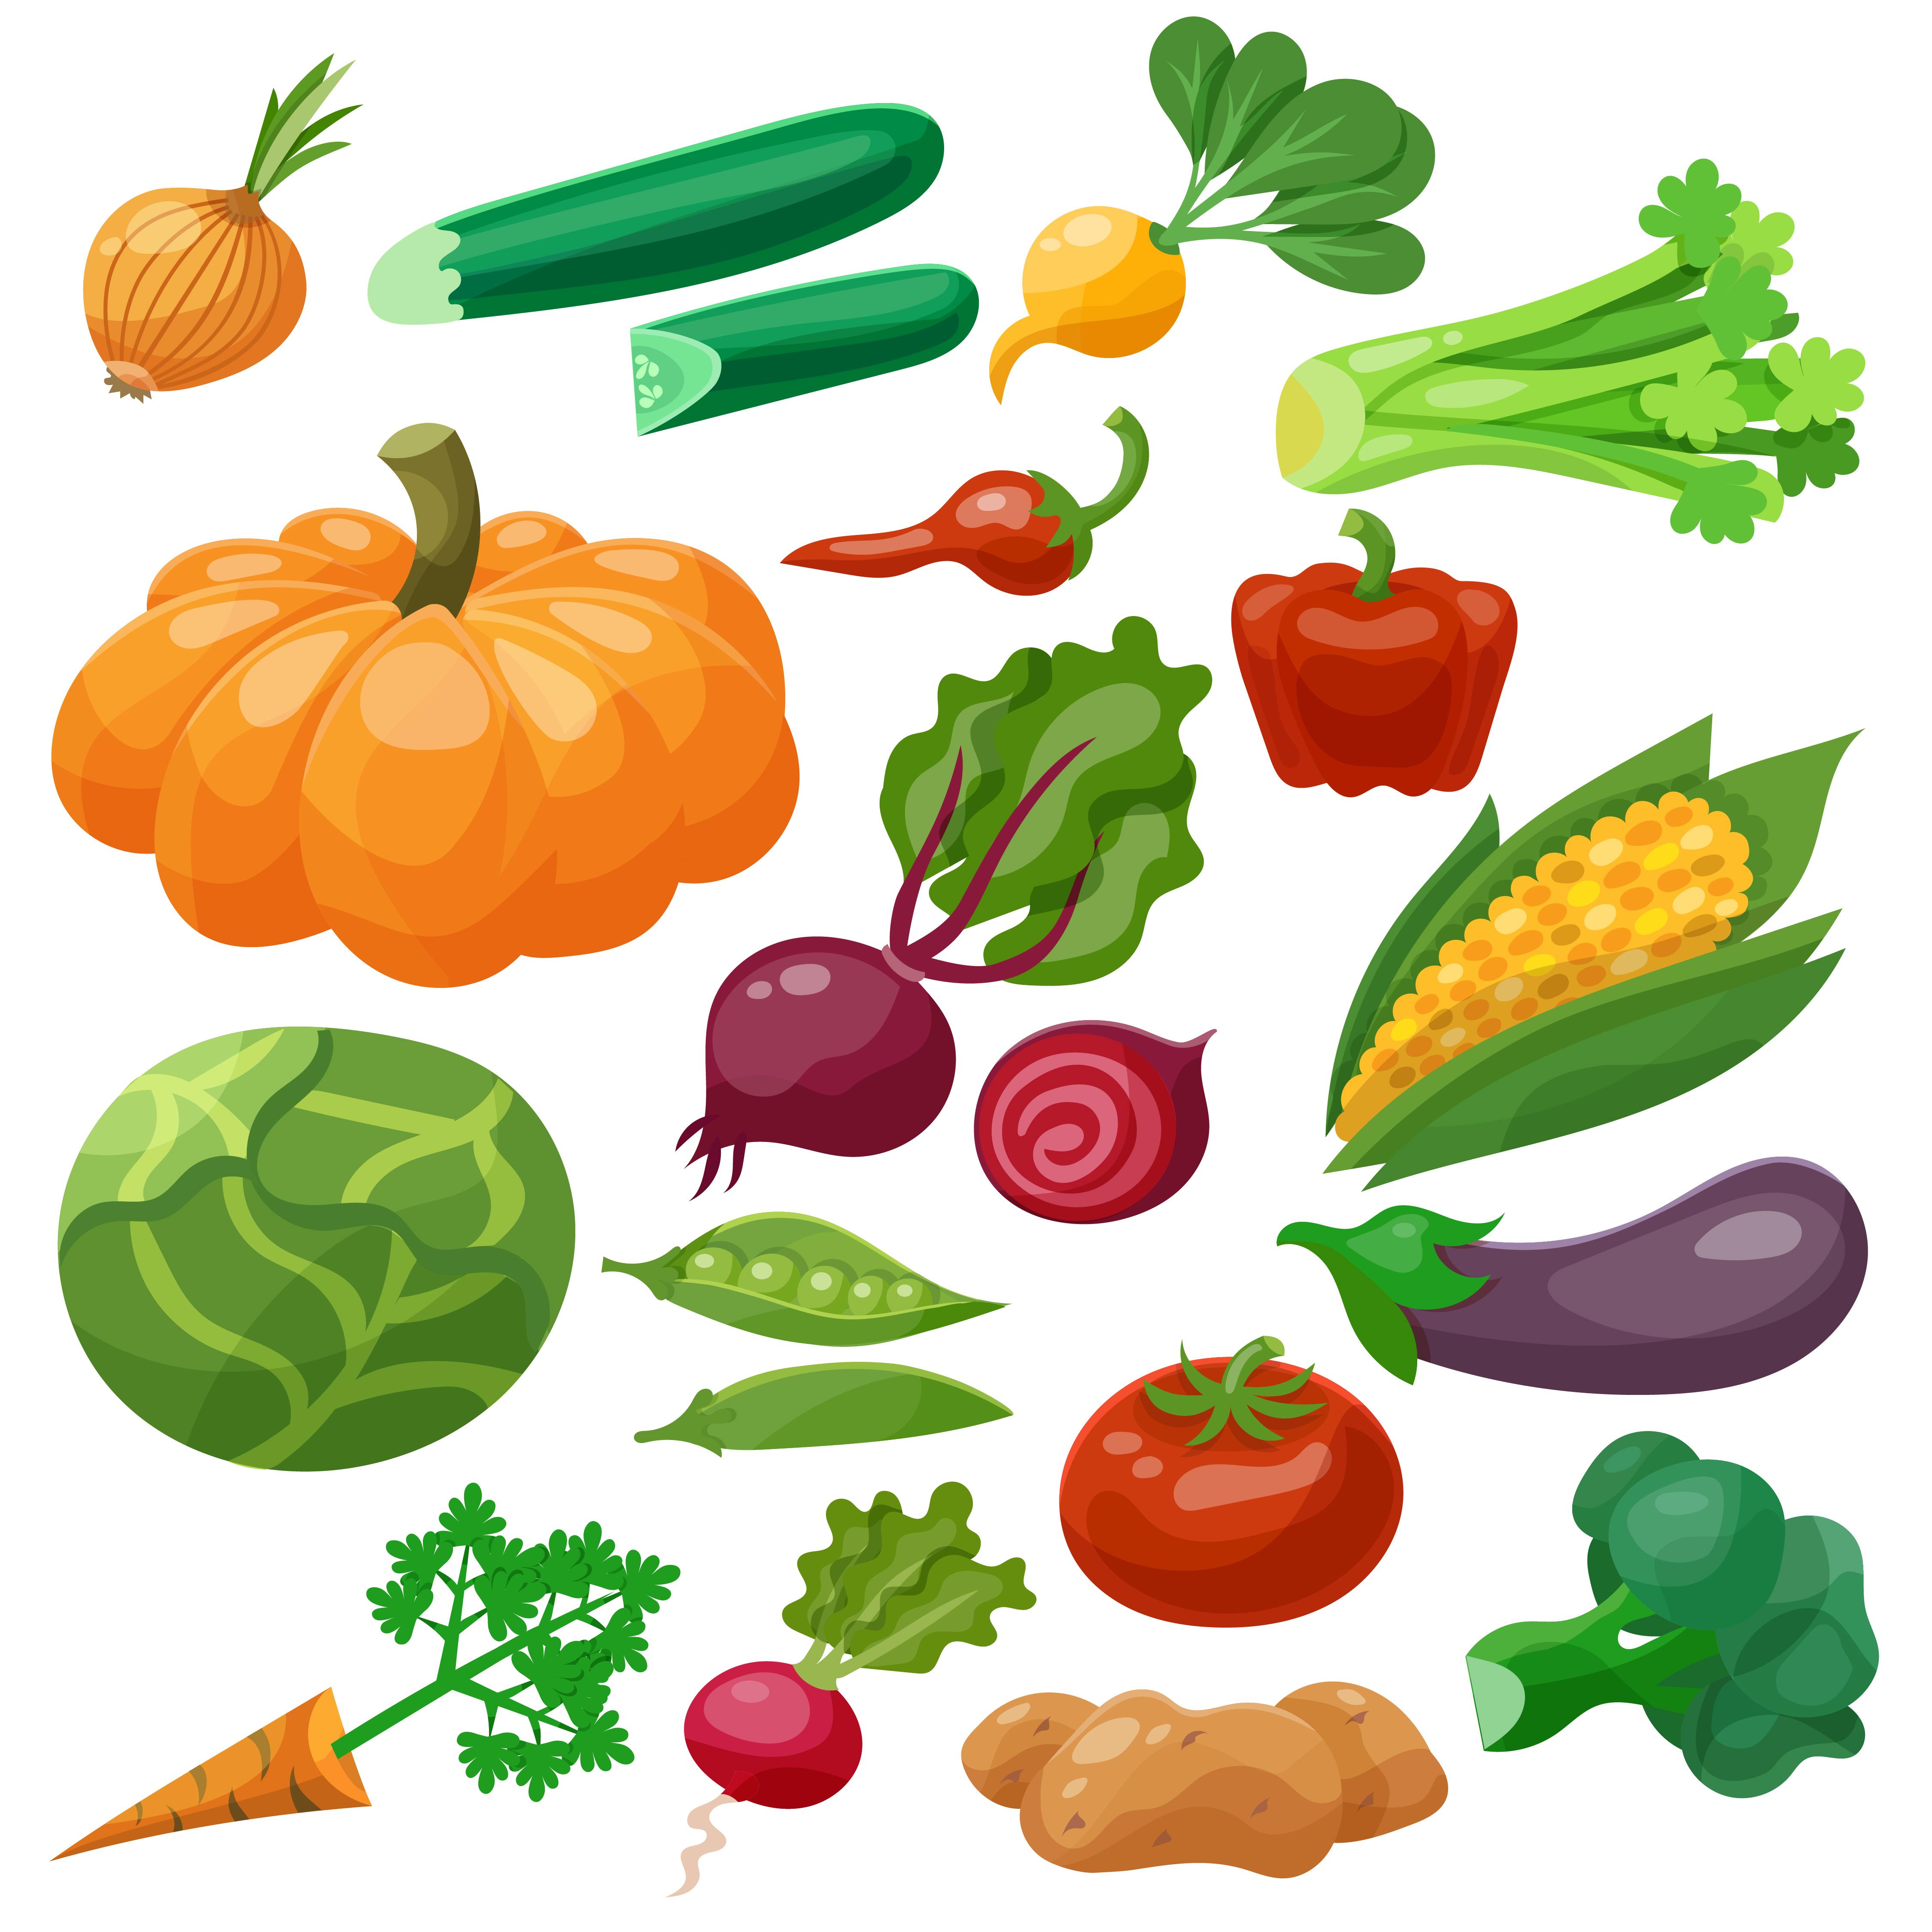 Vegetables Icons Set 461333 - Download Free Vectors